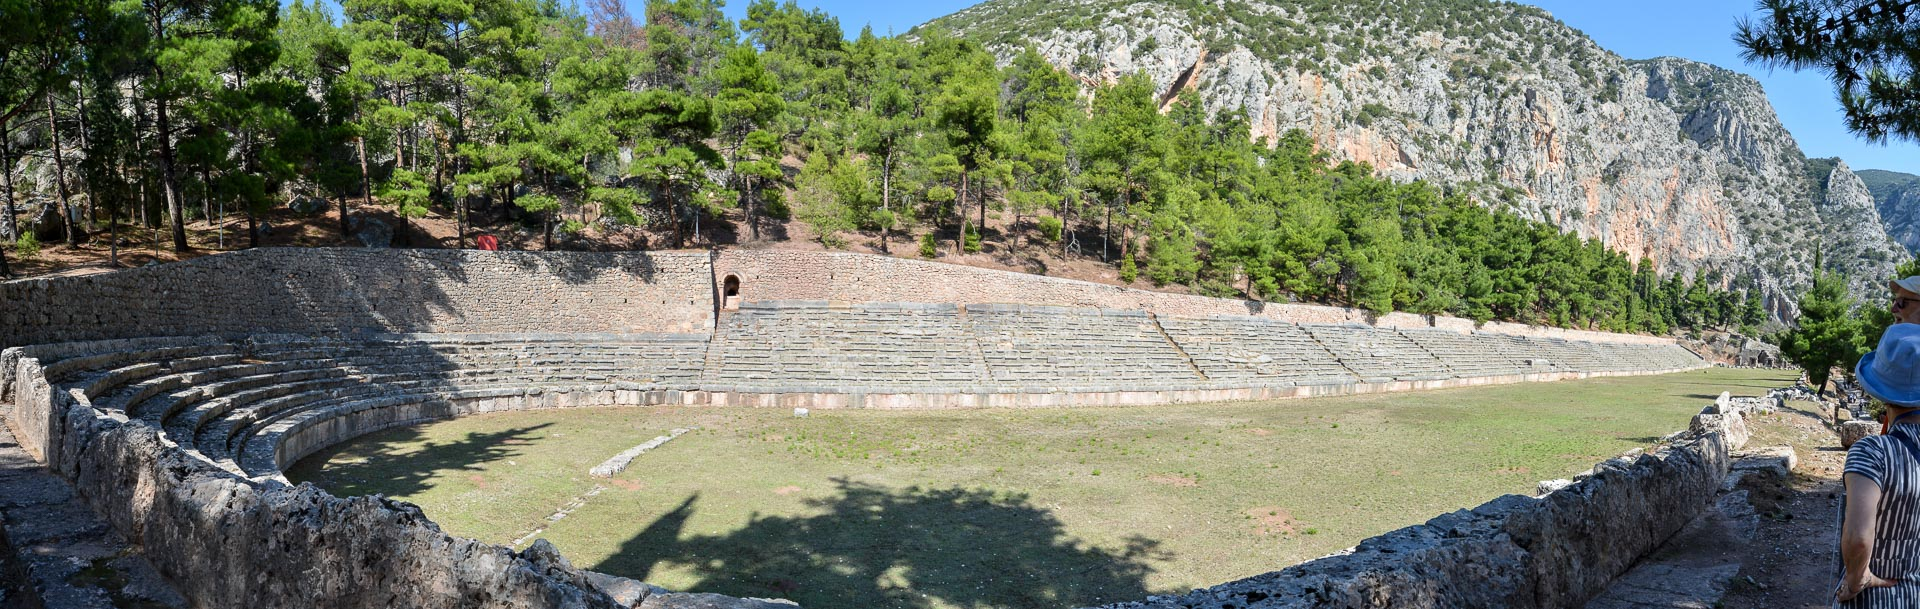 Stadium at the top of Delphi